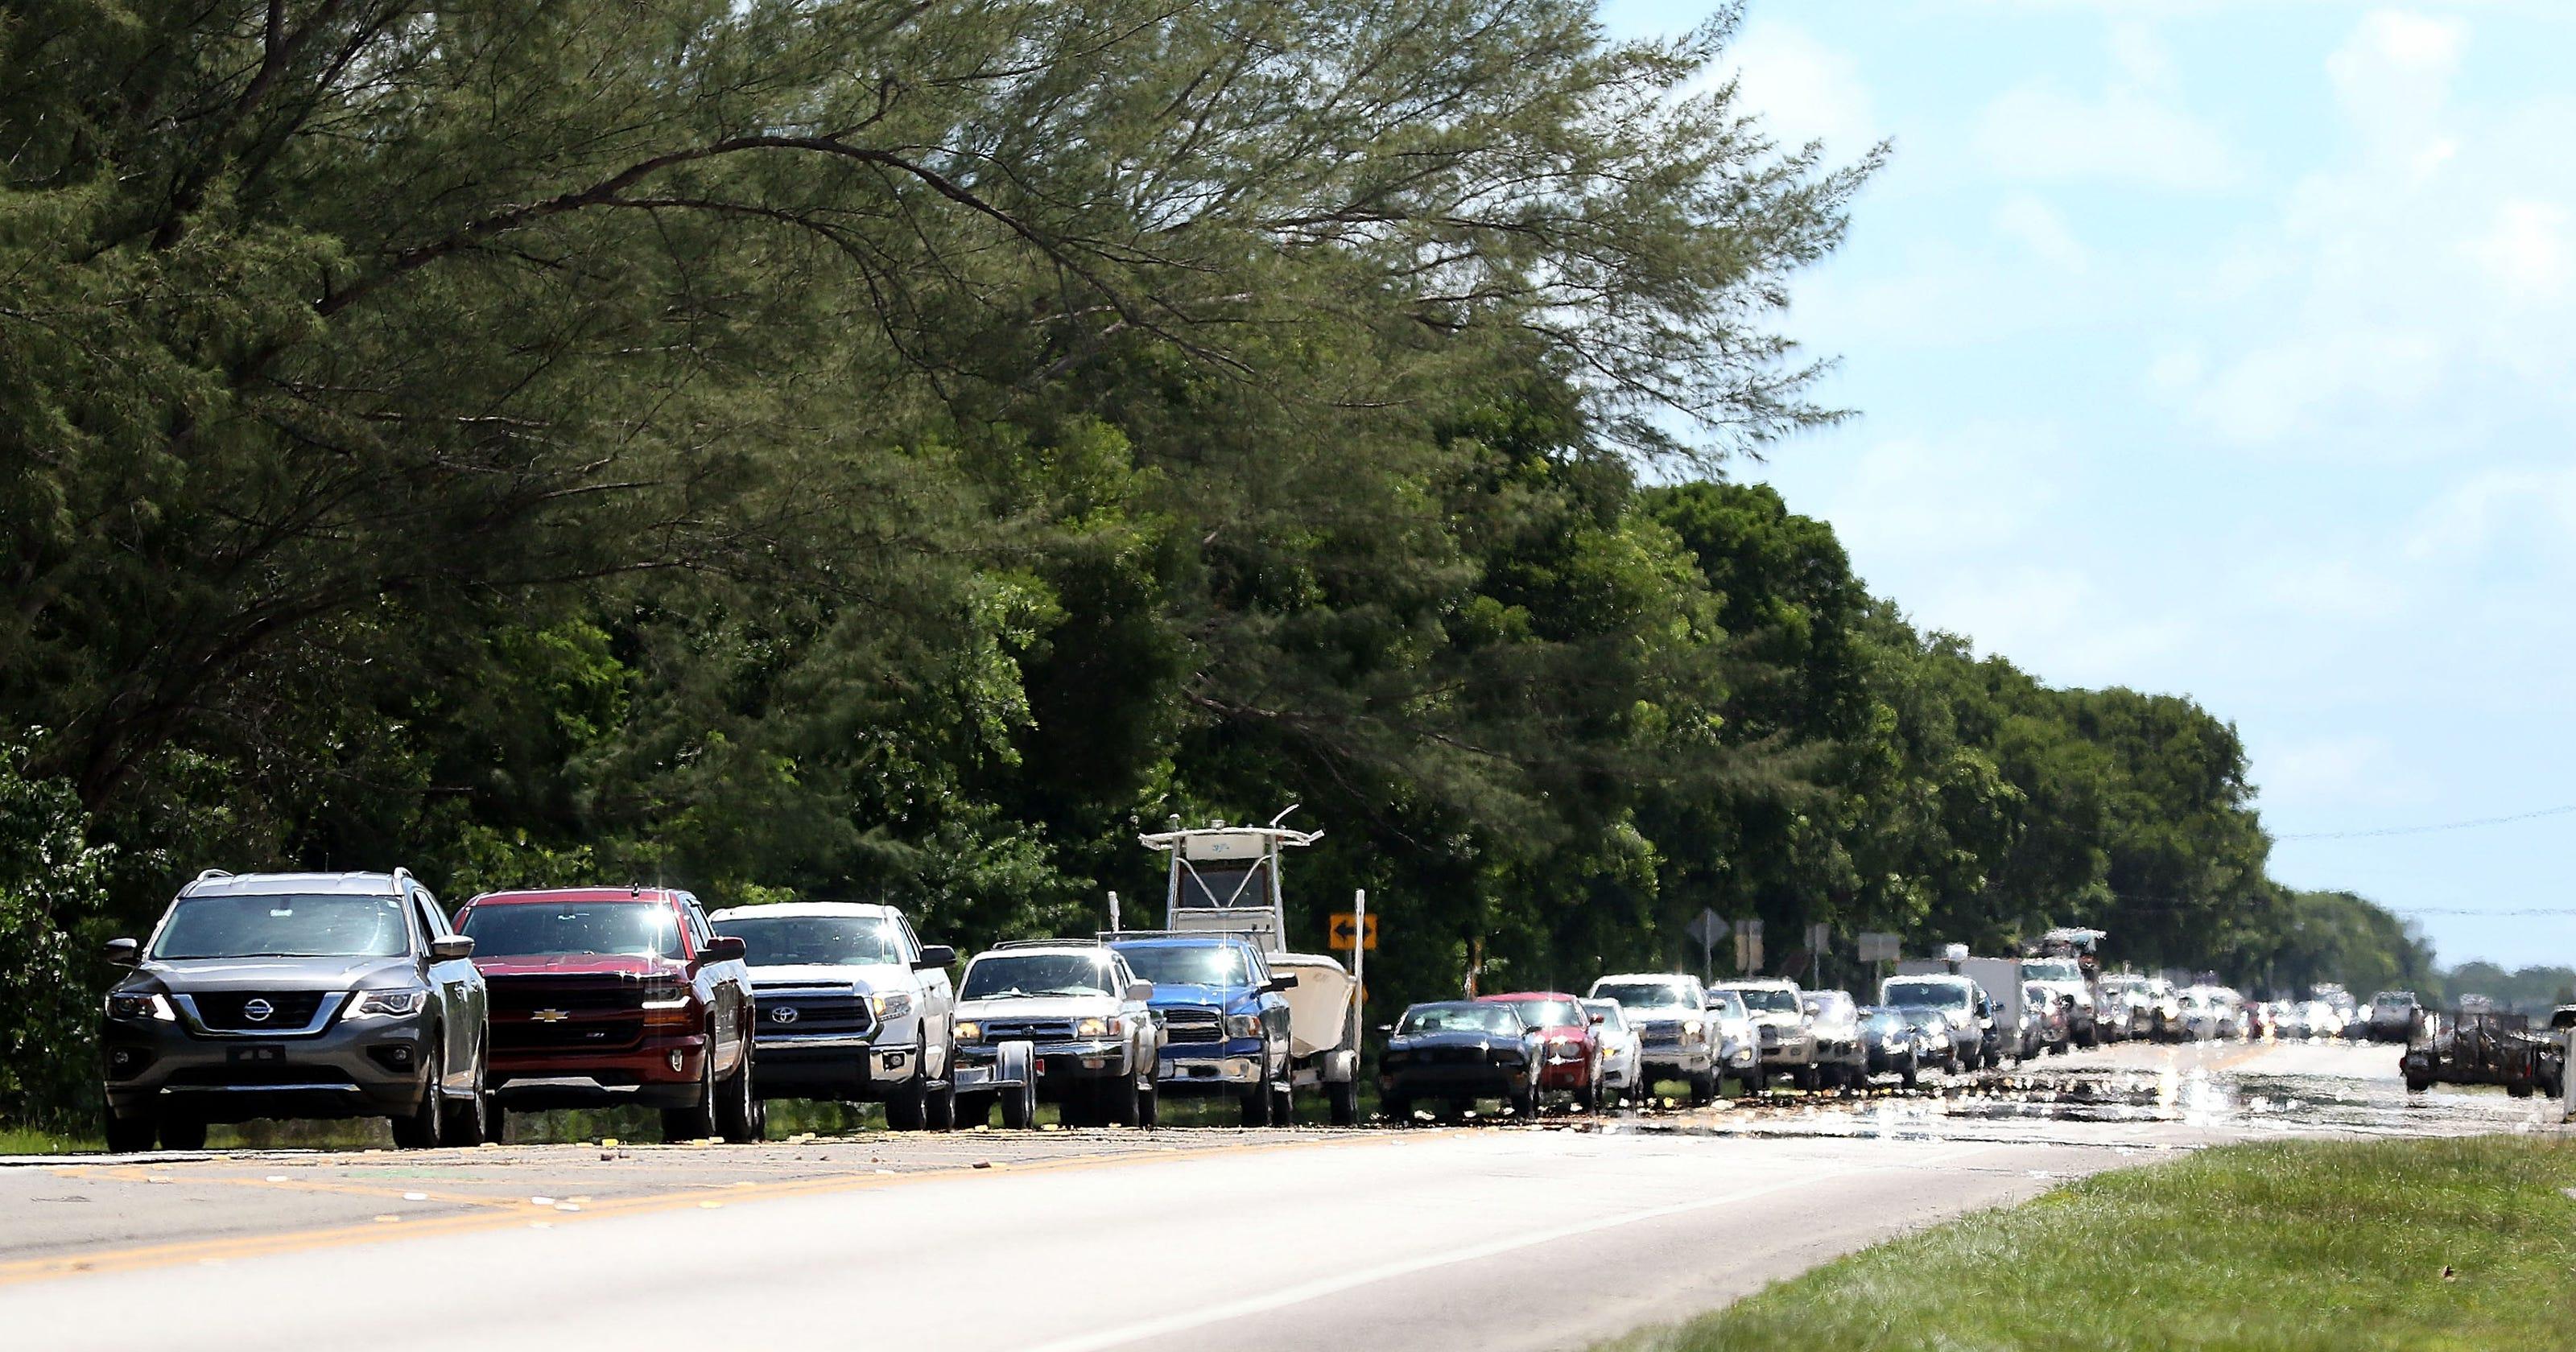 e15939ed913 Florida tourism will take hit from Hurricane Irma